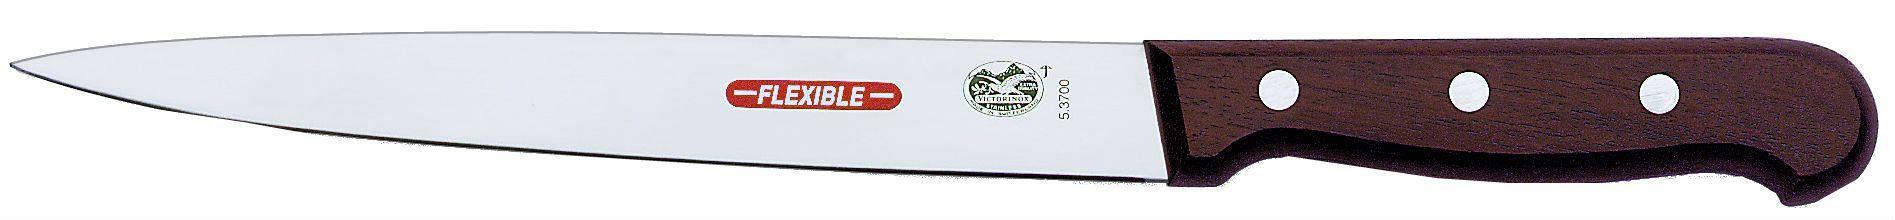 Victorinox 5.3700.20 - нож филейный, лезвие 20 см (Brown)